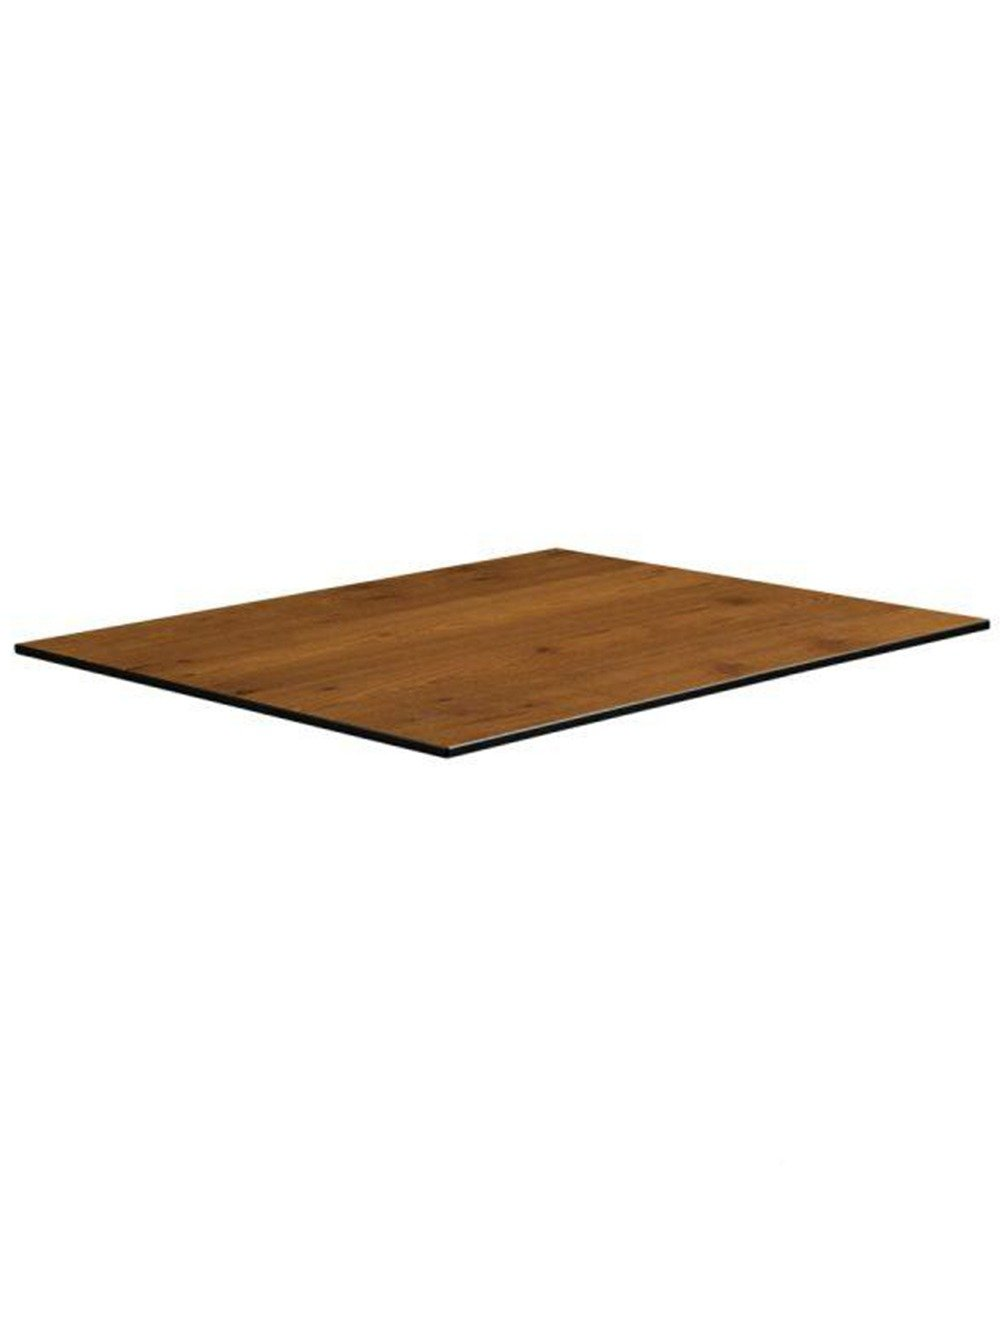 Extrema HP wood laminate Table Top